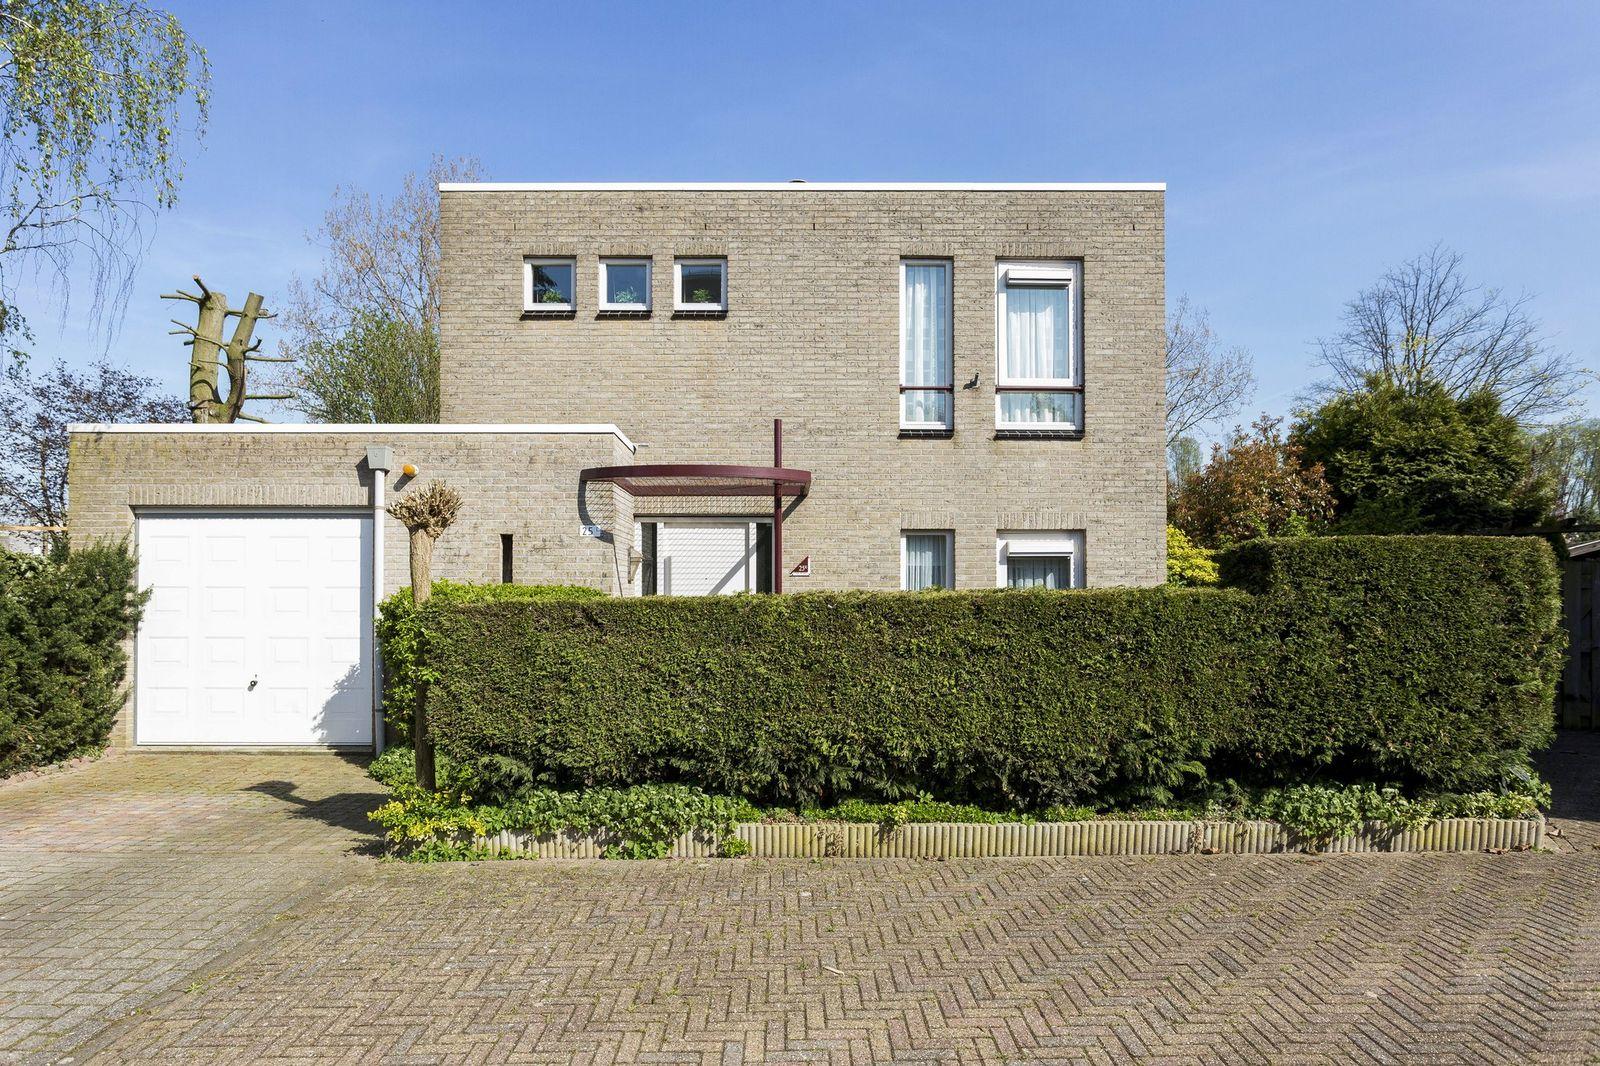 Eimerssingel-Oost 25-C, Arnhem